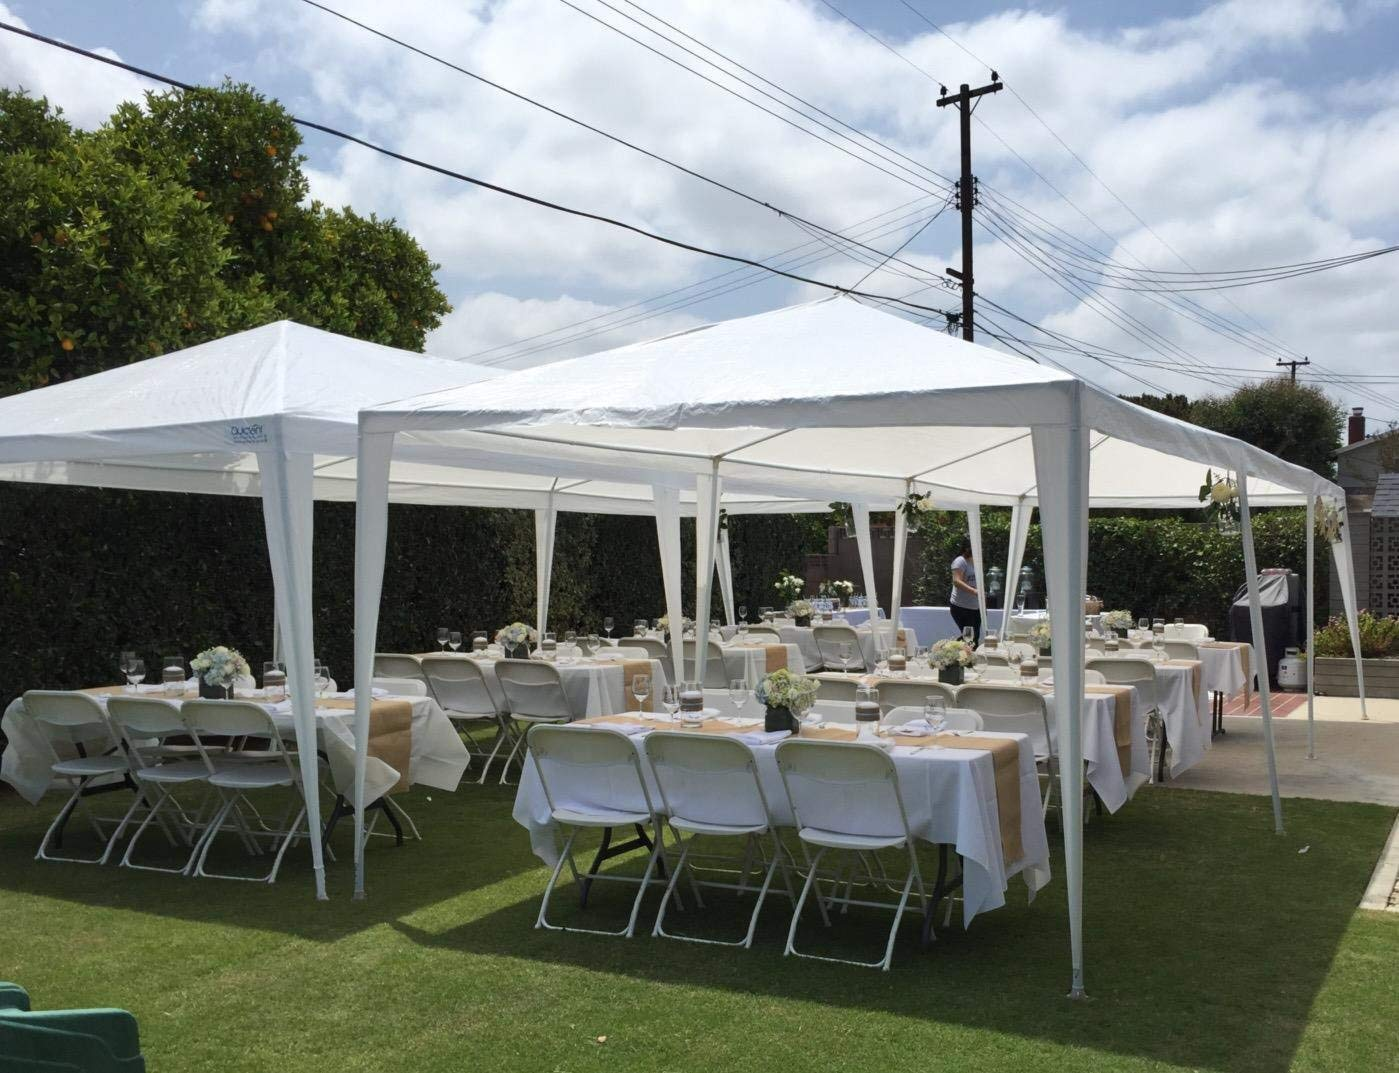 outdoor canopy tent amazon.com : quictent 10 x 30 outdoor canopy gazebo party wedding tent YTTOCEG